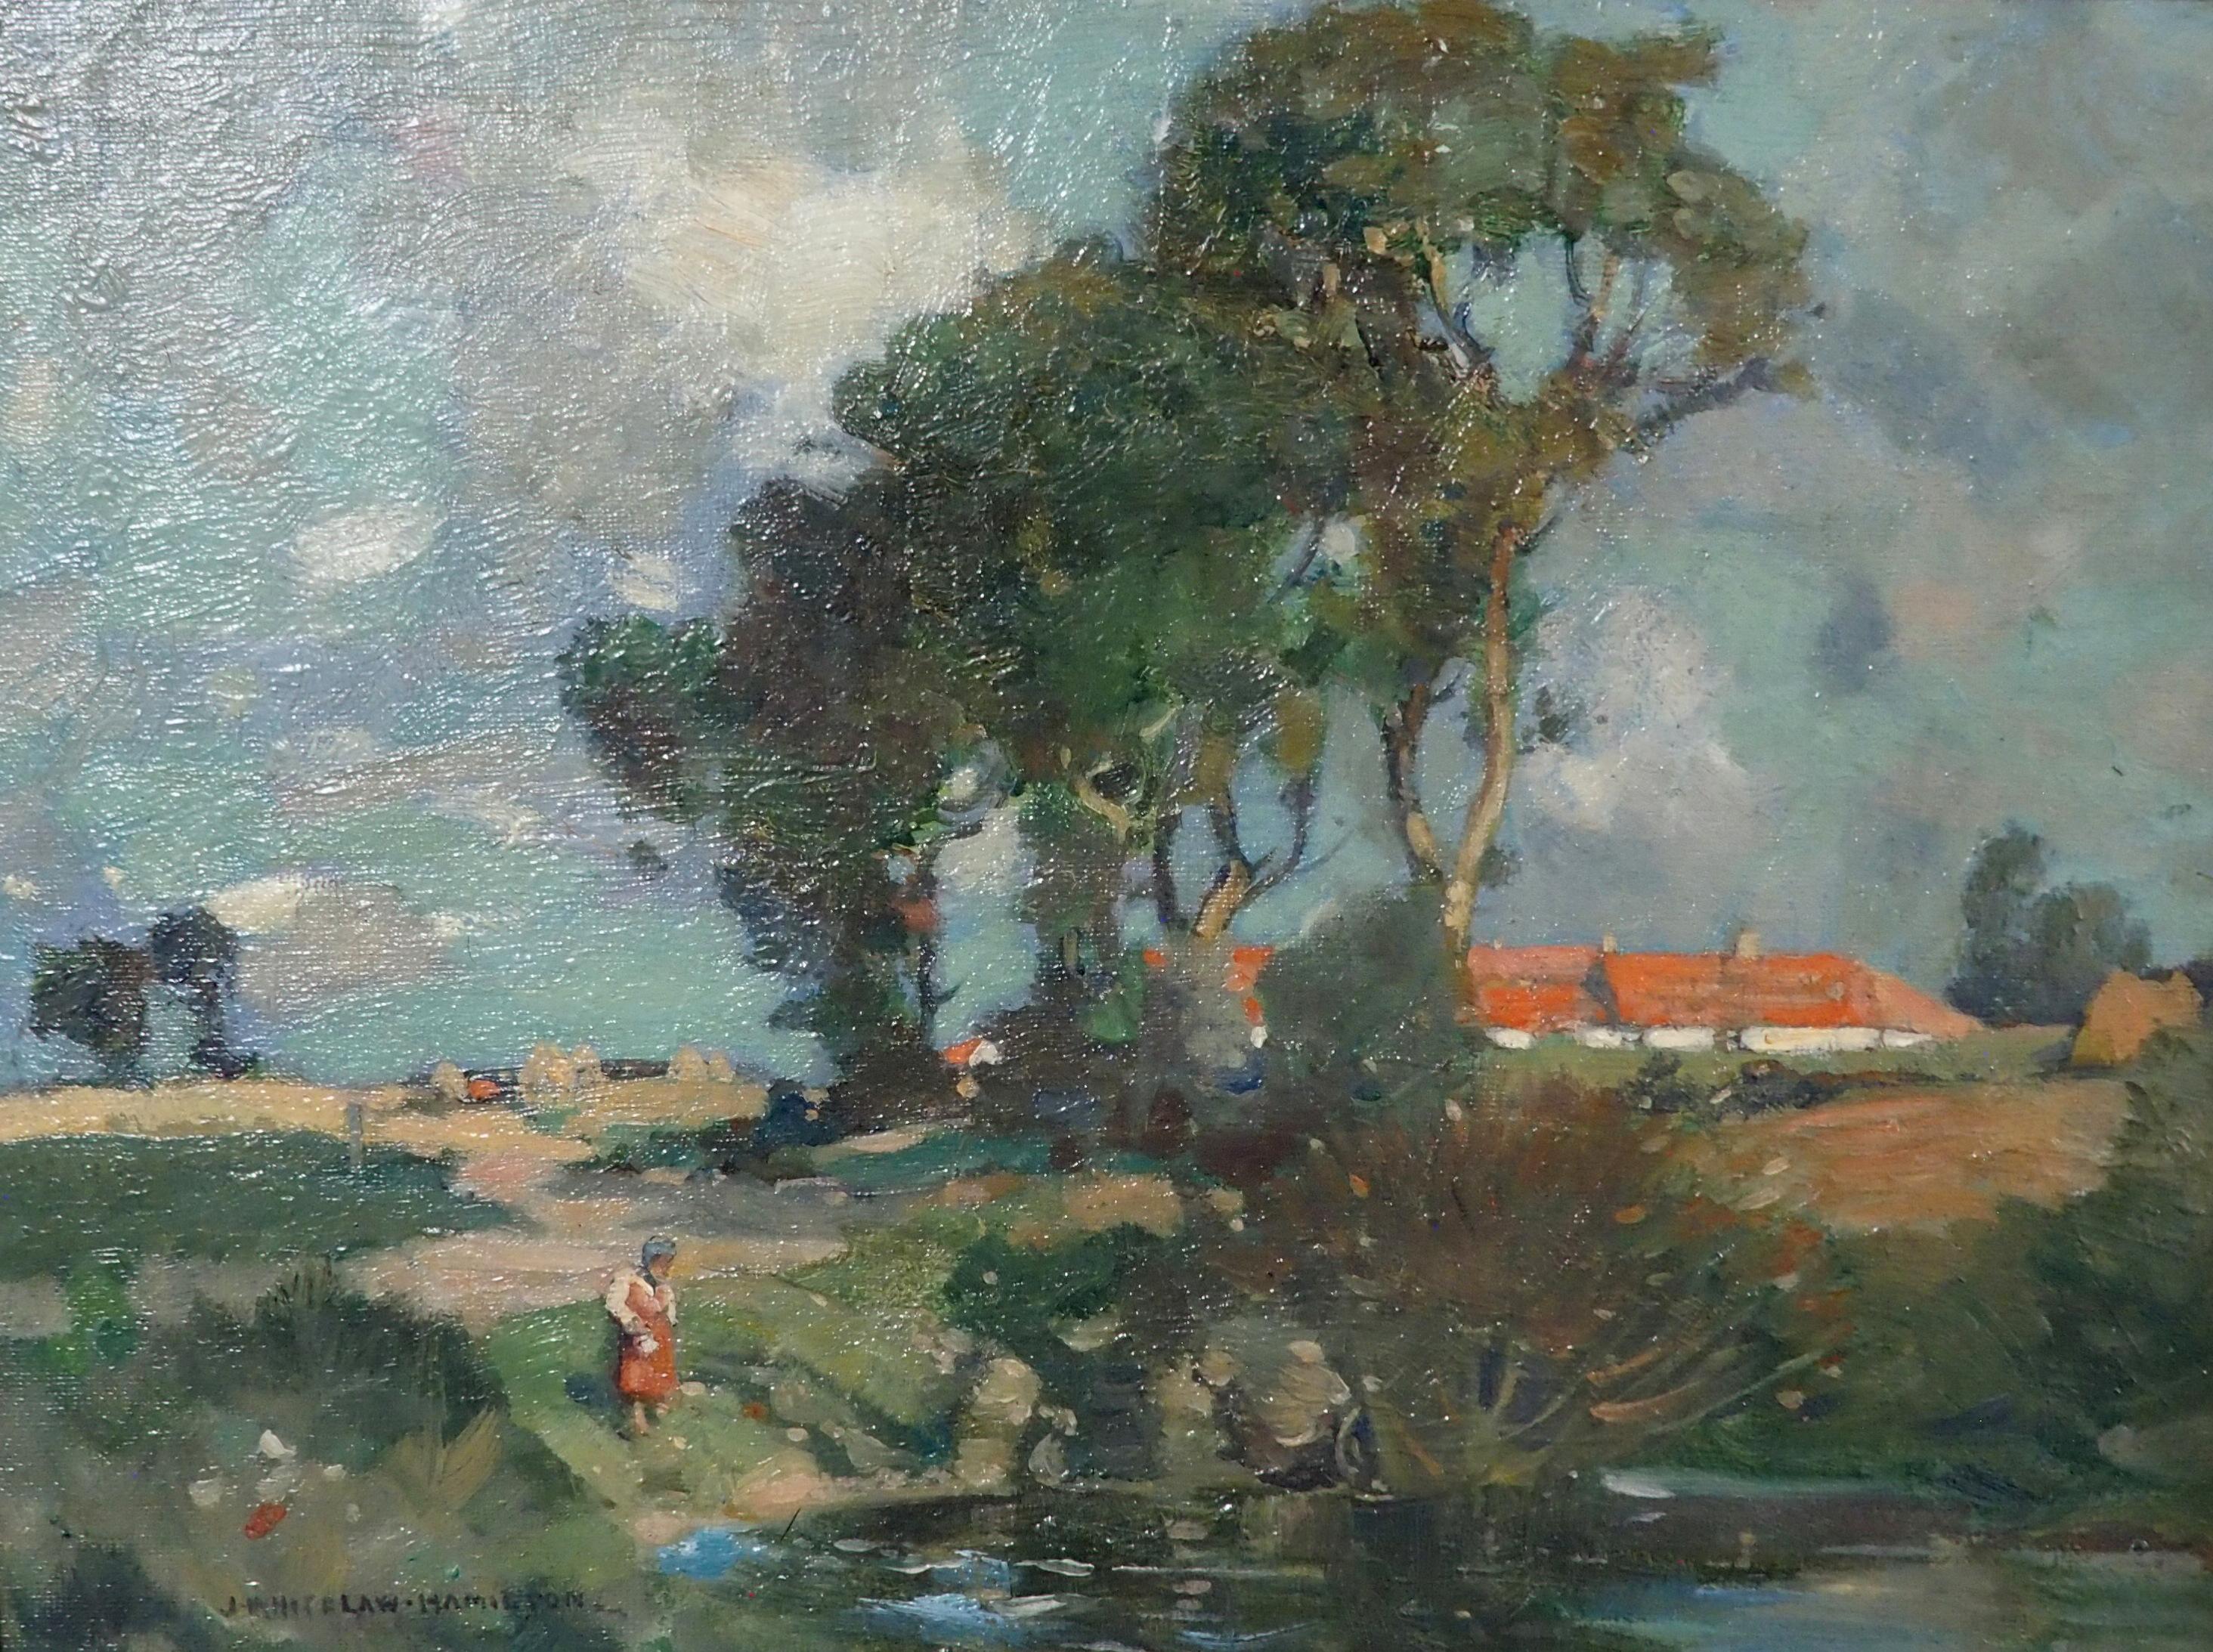 JAMES WHITELAW HAMILTON RSA, RSW (SCOTTISH 1860-1932) SUMMERTIME Oil on canvas board, signed, 23,5 x